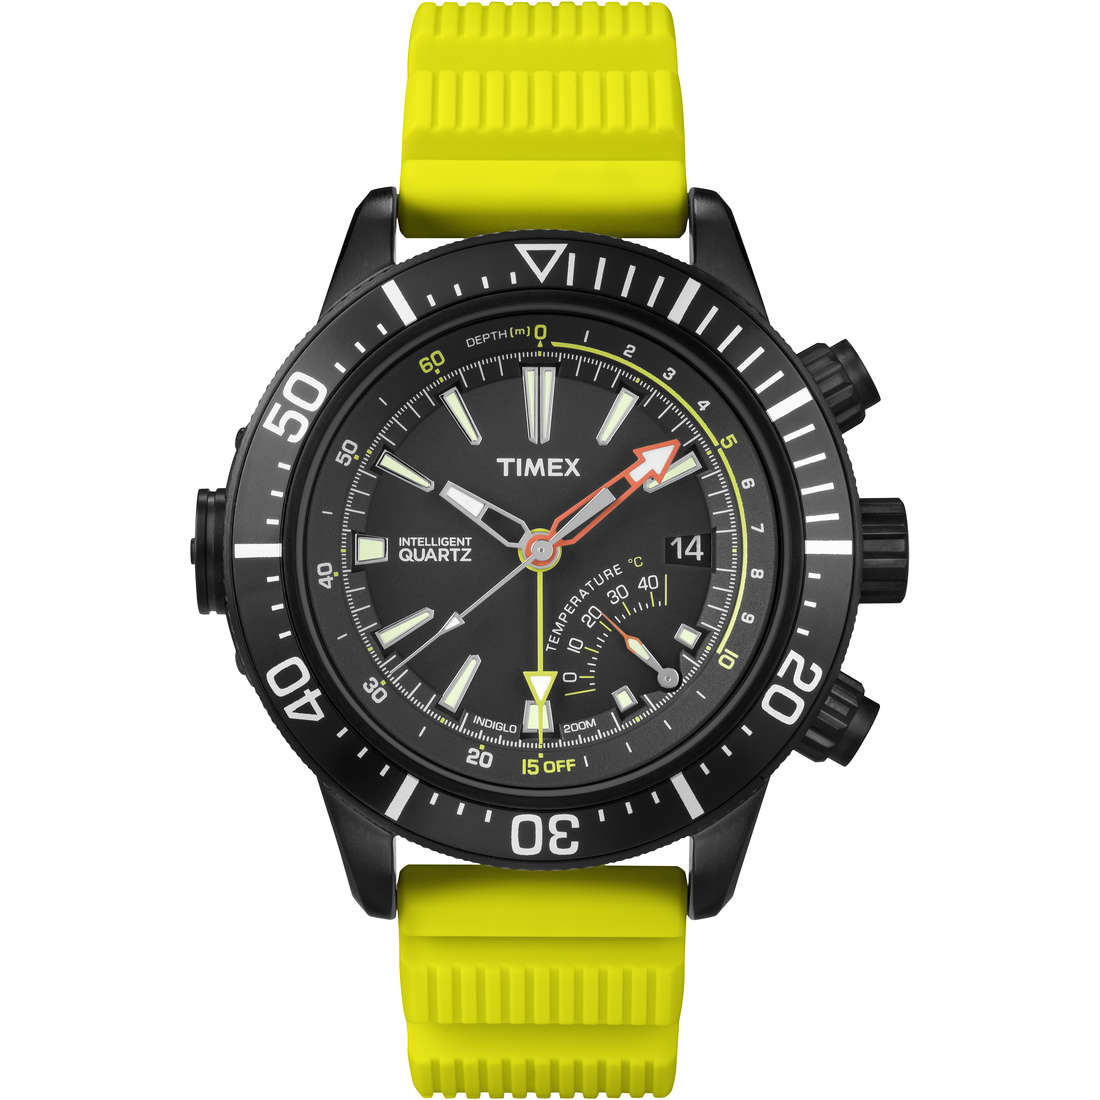 montre multifonction homme Timex Iq Profondimetro T2N958